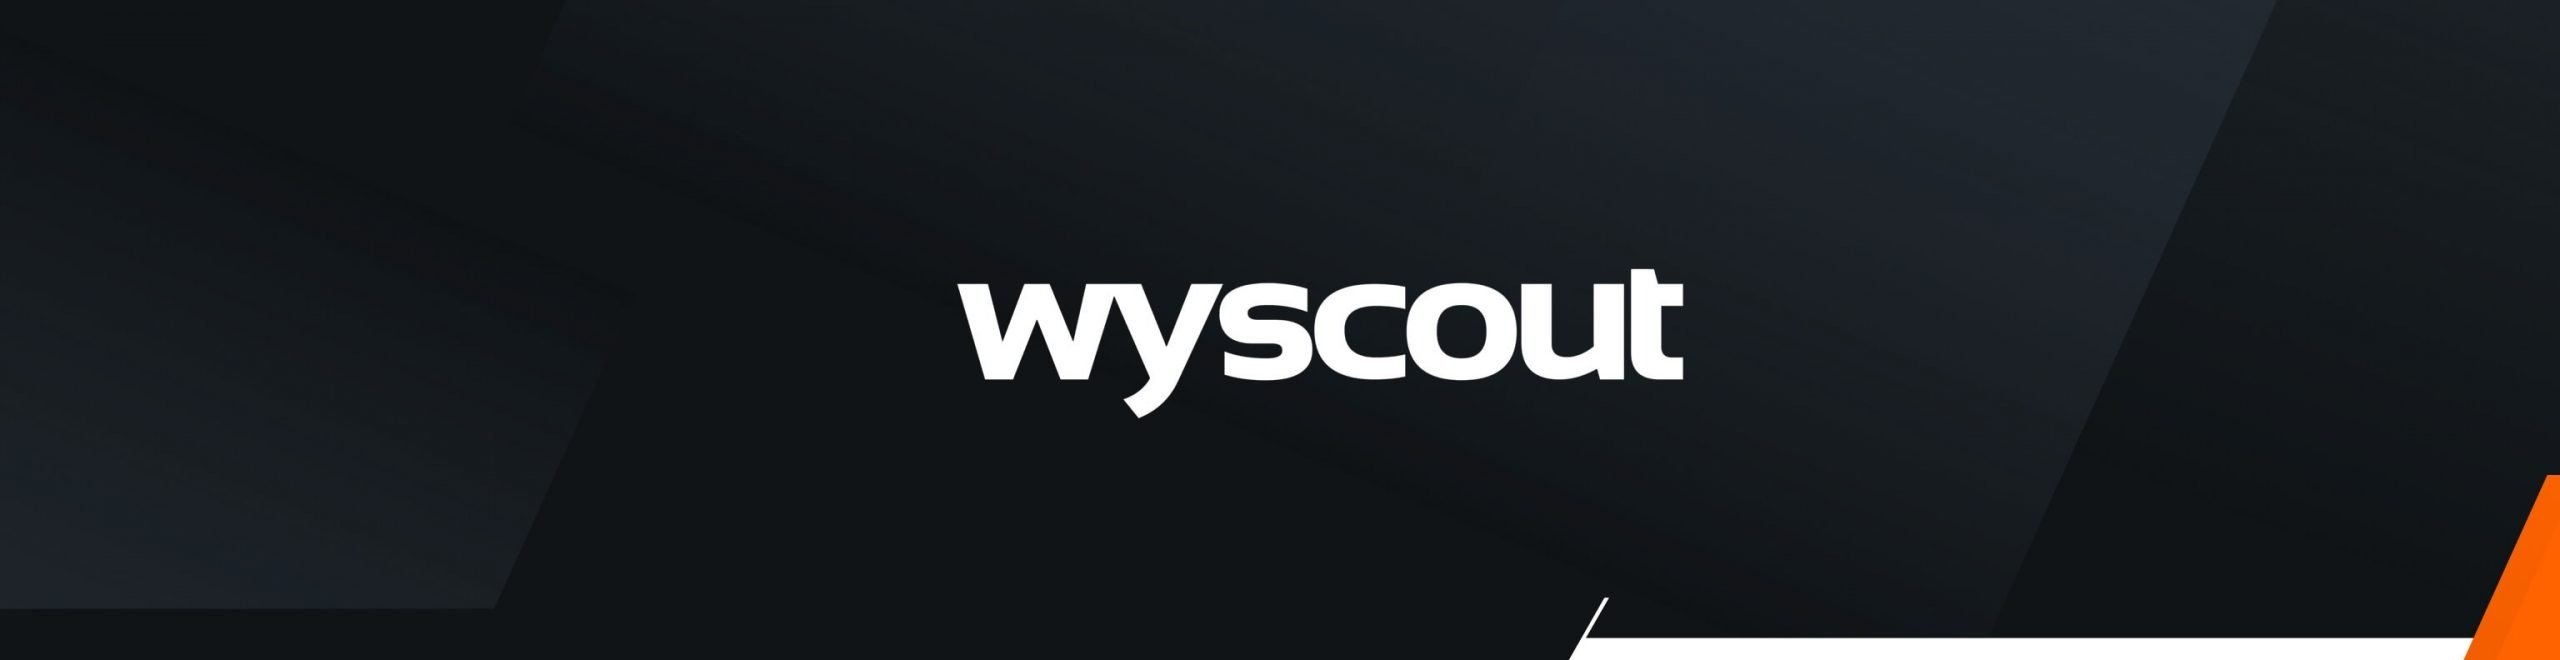 Wyscout. Обзор сервиса. Чем Wyscout полезен в ставках на футбол?